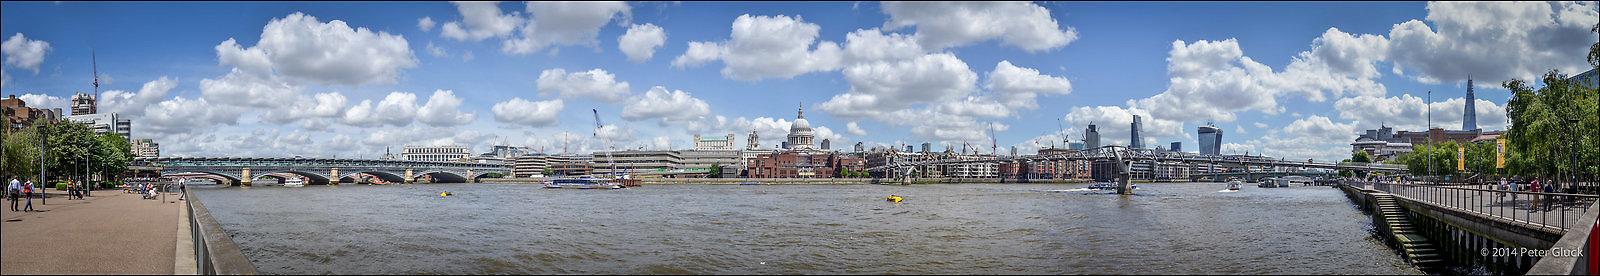 London 2014 06 10 PG 158